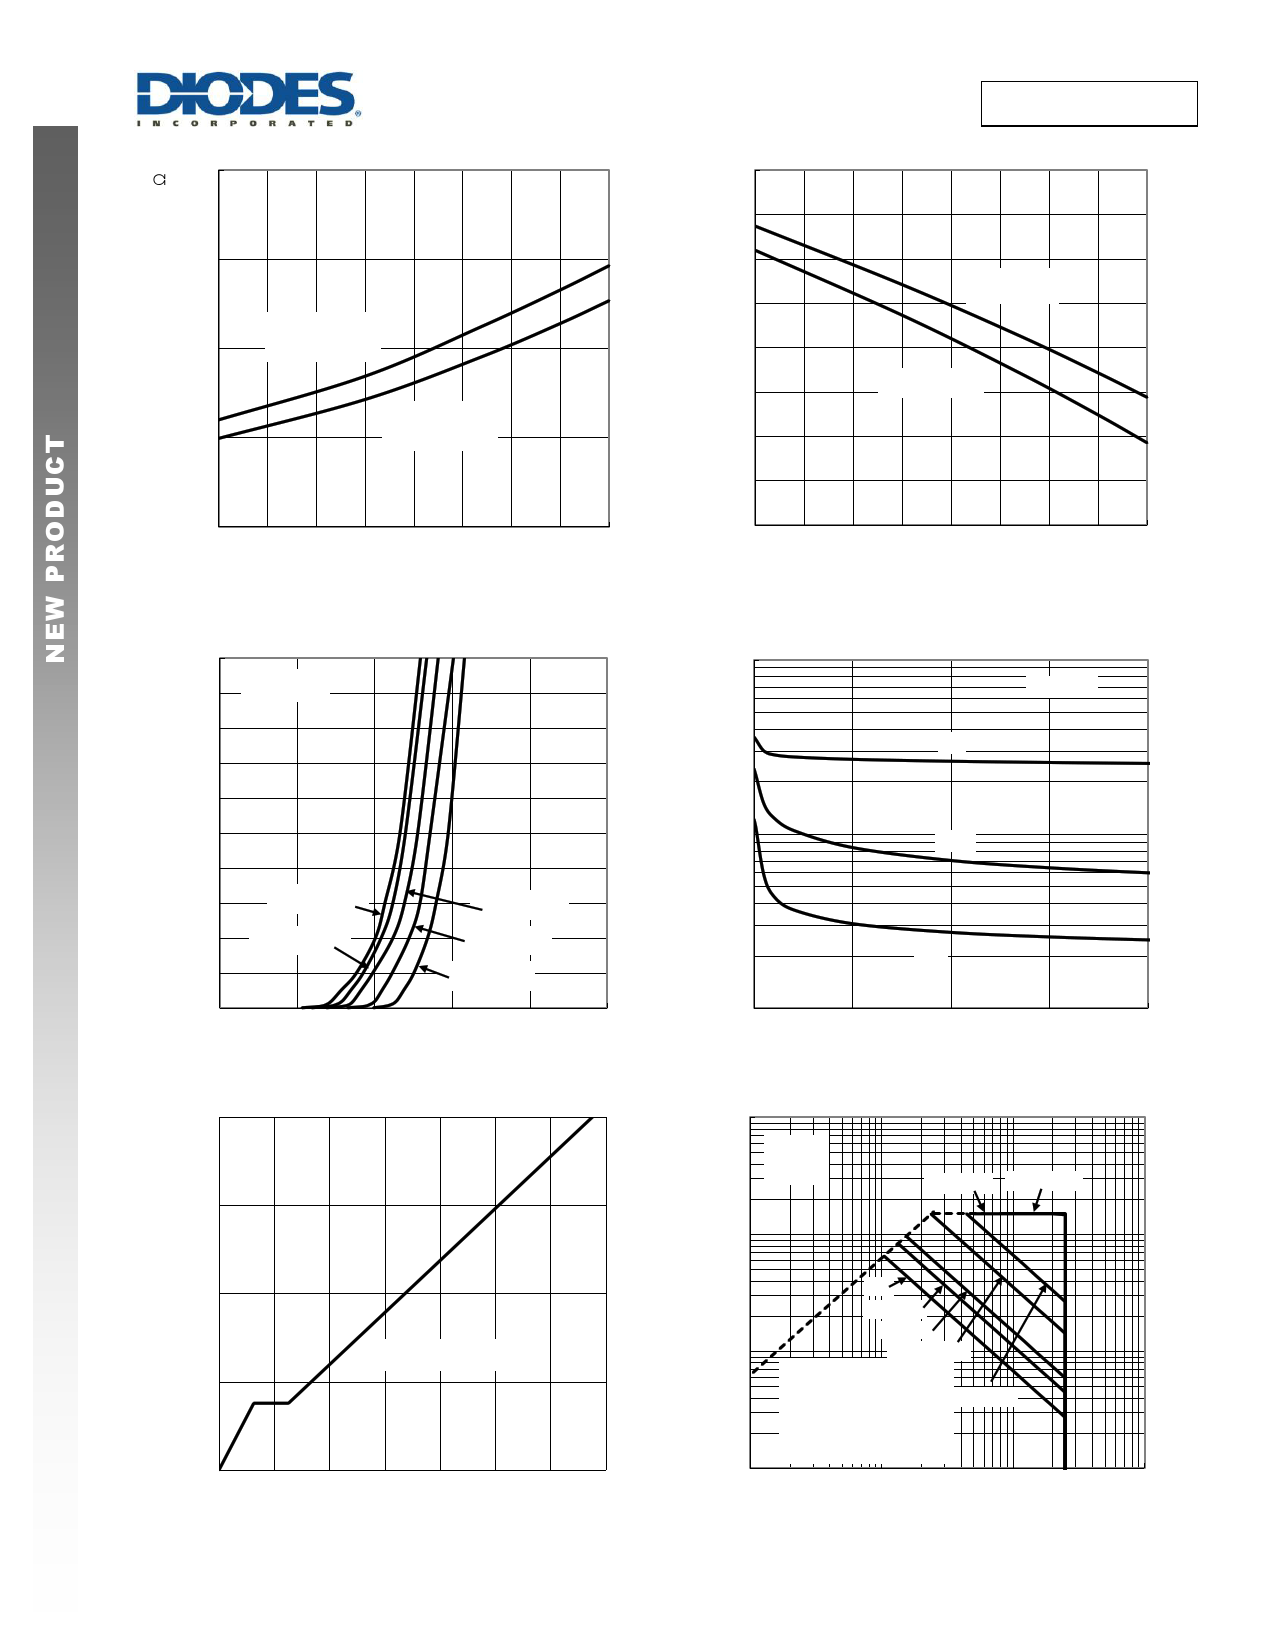 DMC25D0UVT pdf